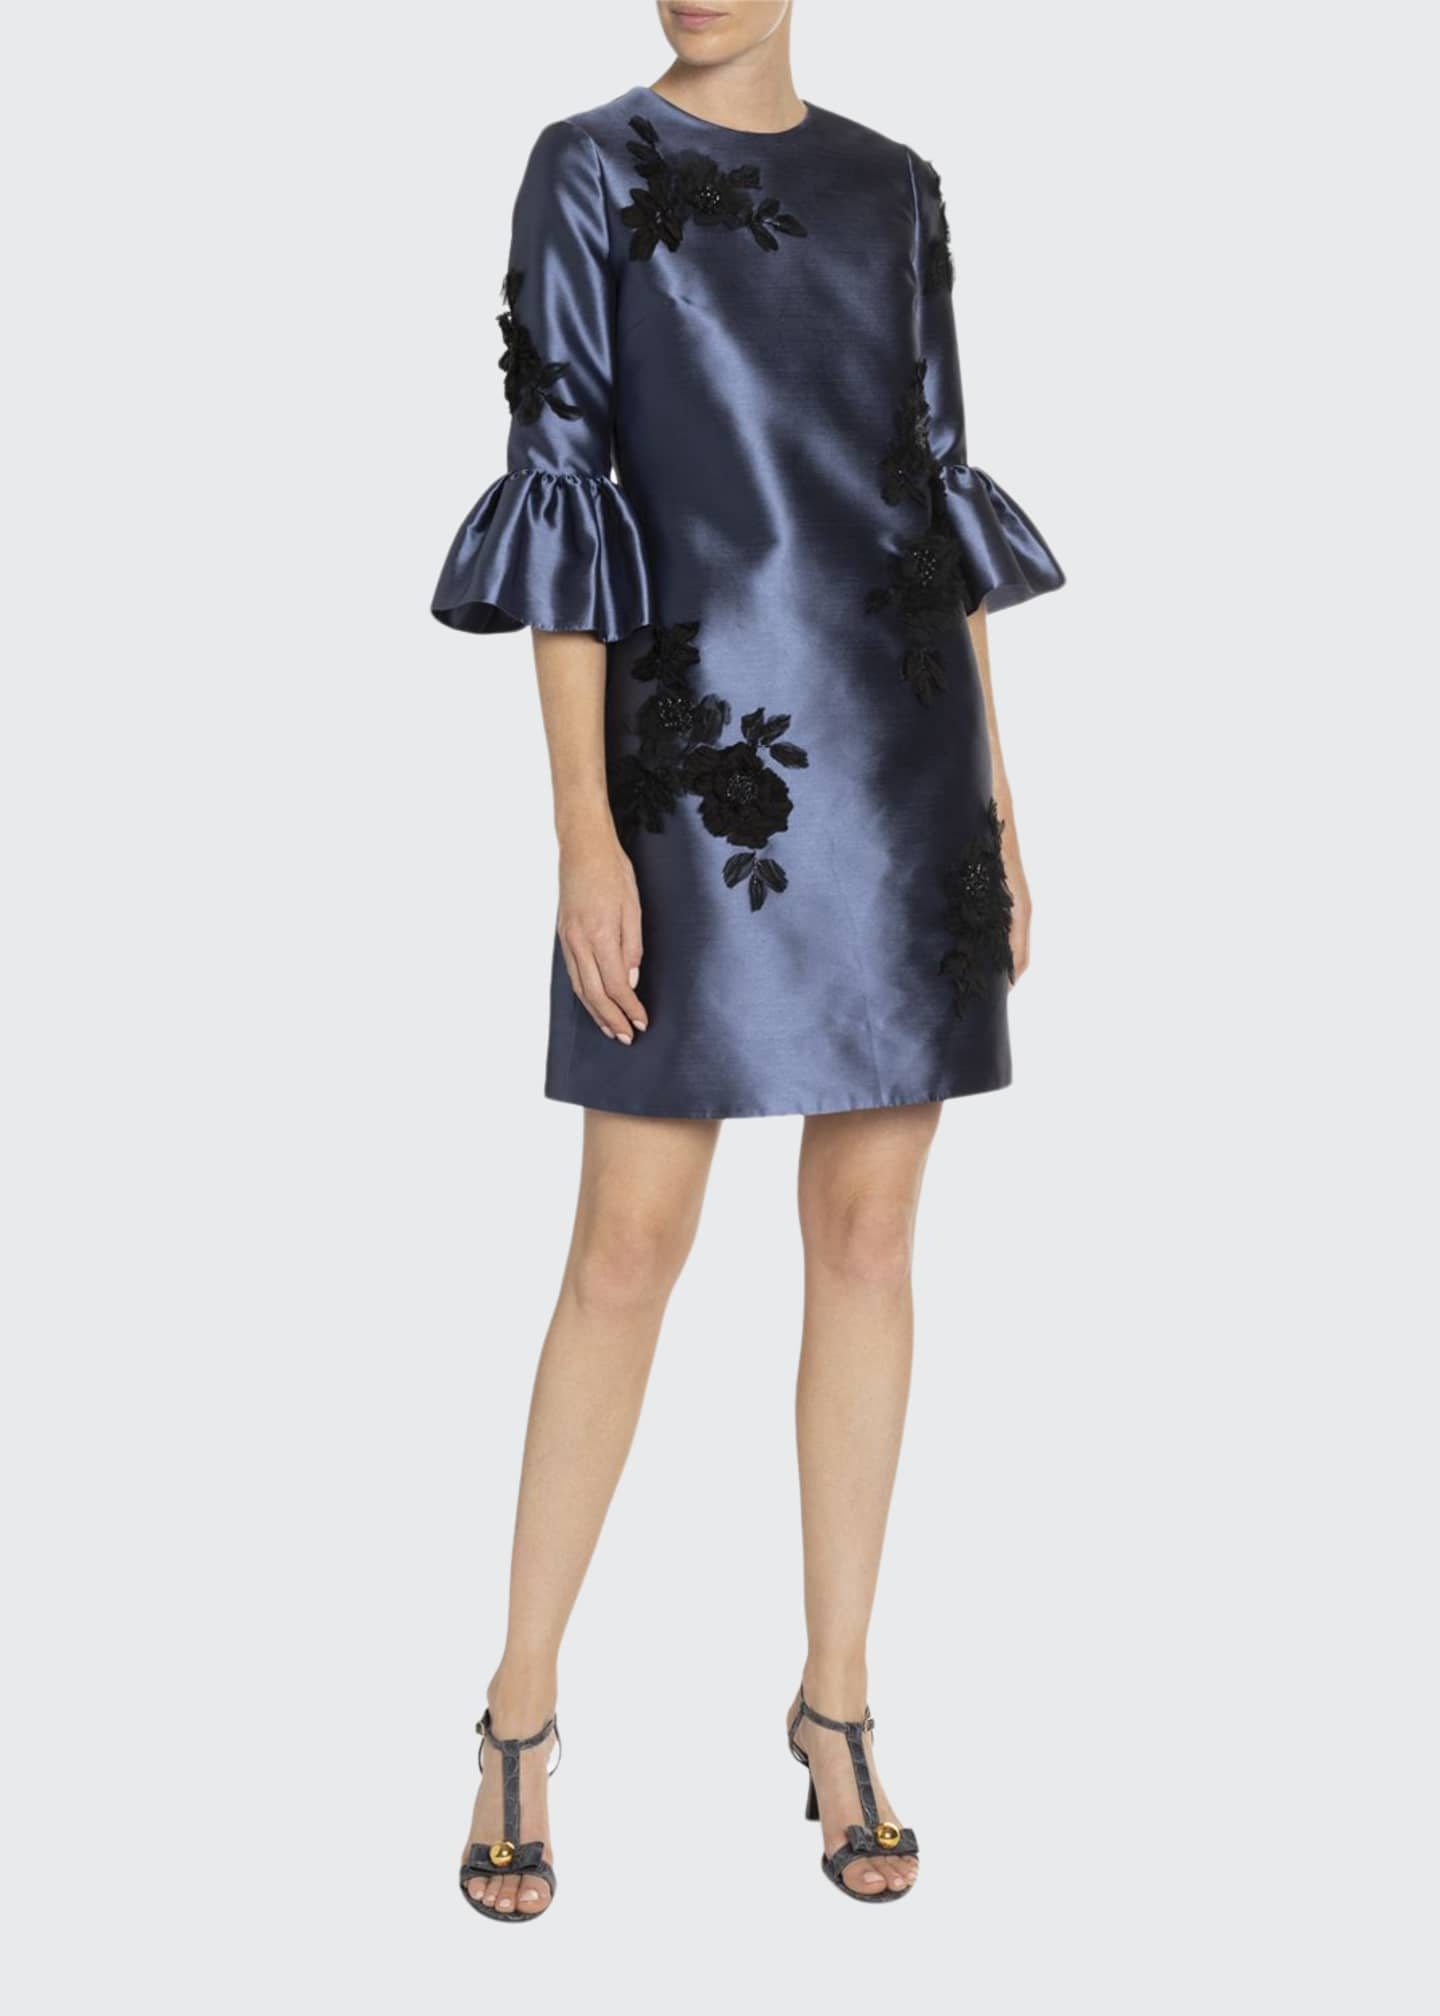 Erdem Elijah Rose-Embroidered Bell-Sleeve Taffeta Dress